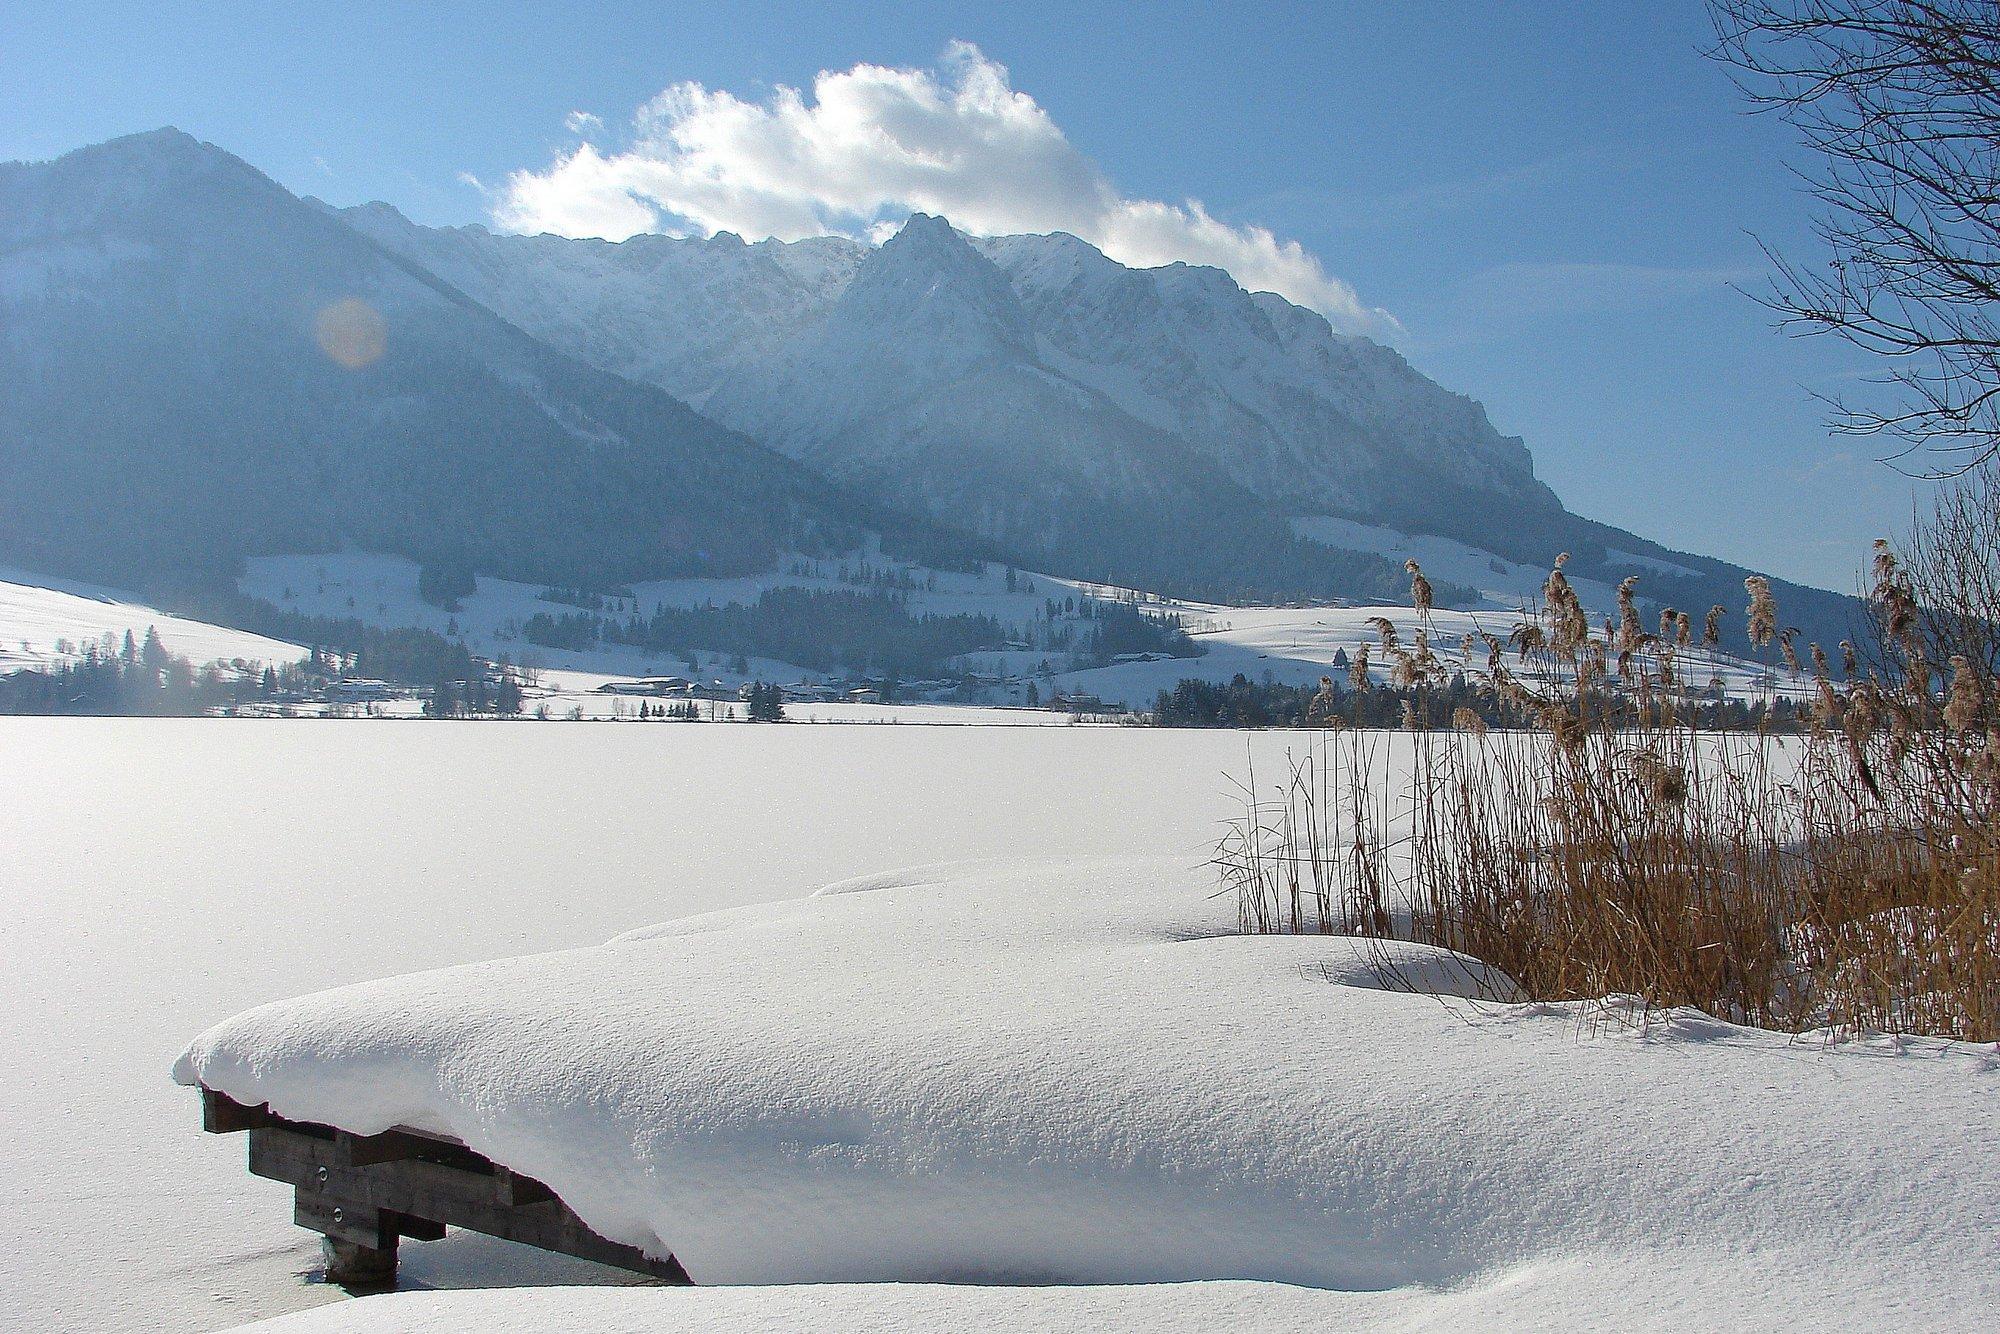 Winterurlaub im Kaiserwinkl-kaiserwinkl (7)